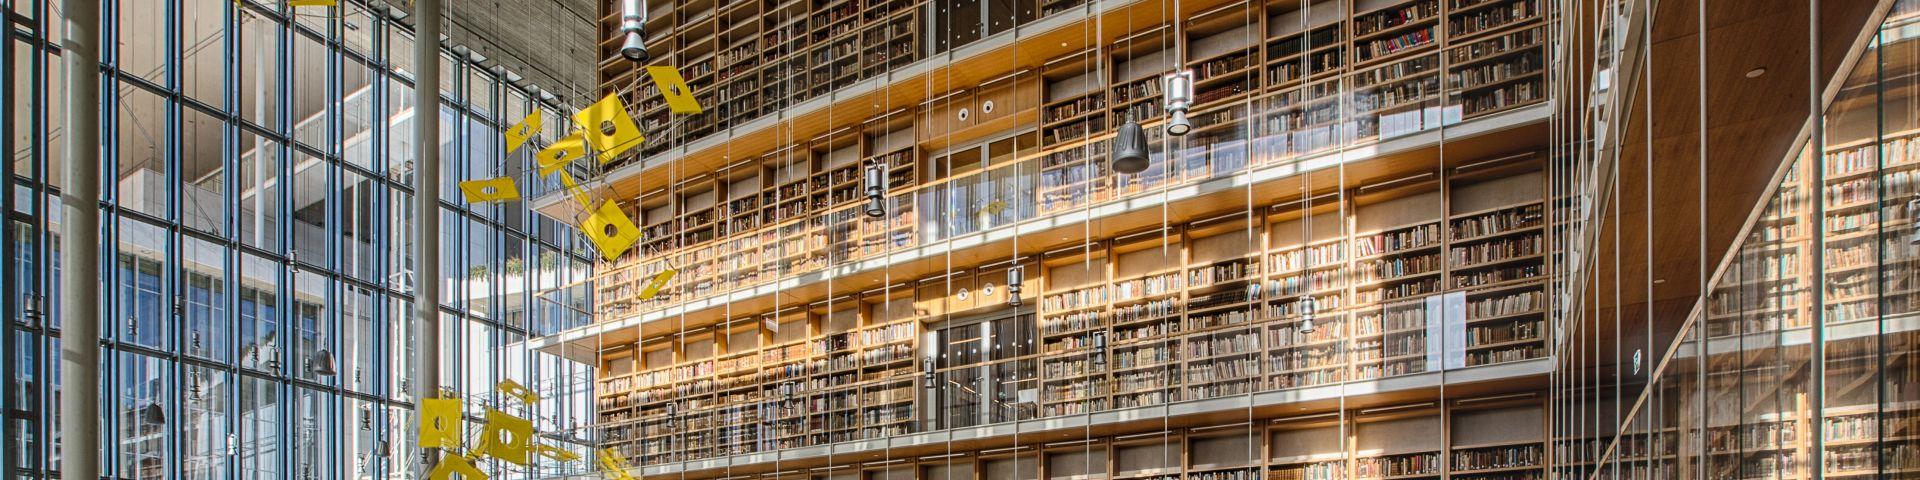 National Library of Greece - Εικόνα